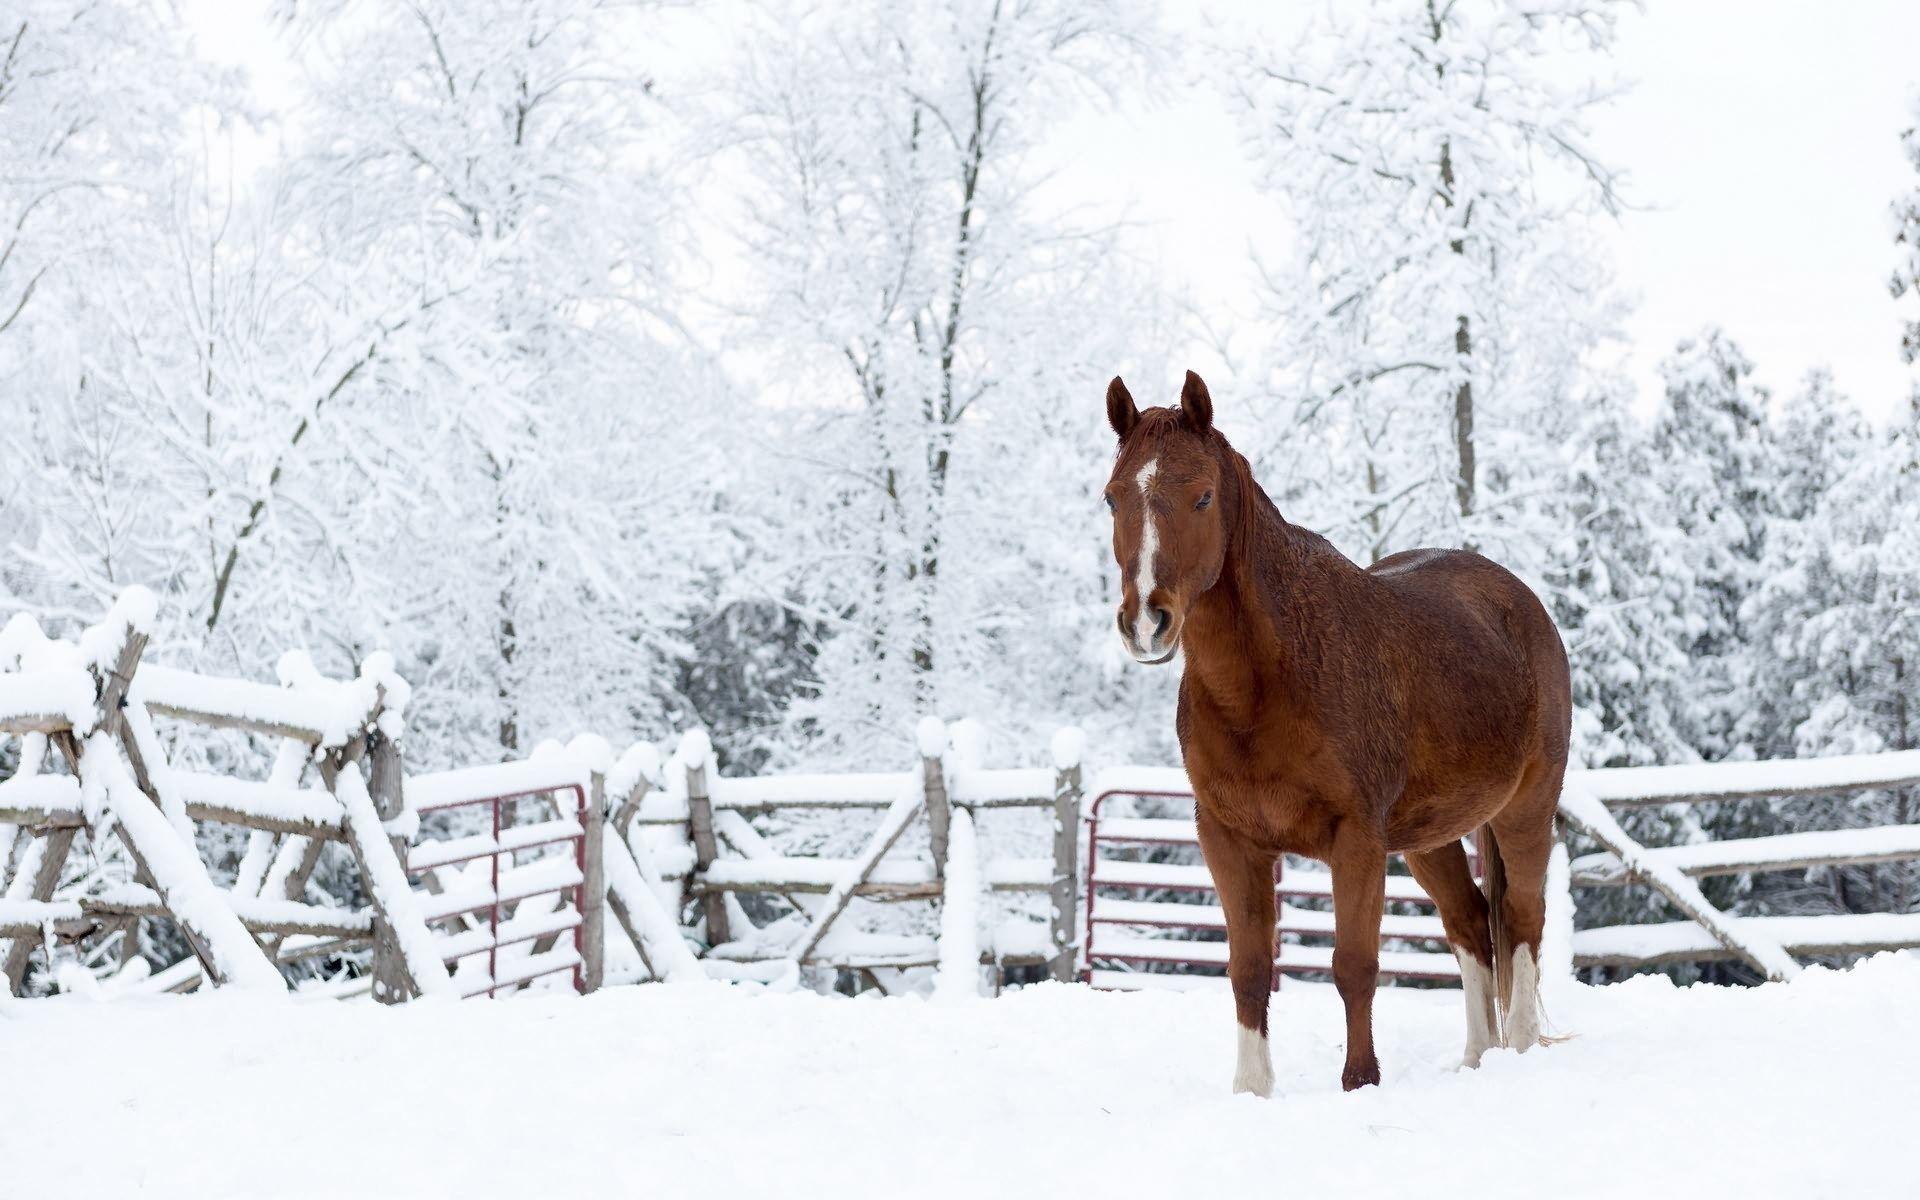 1919555 Horse Category Free Desktop Wallpaper Downloads Horse Horses In Snow Horses Winter Wallpaper